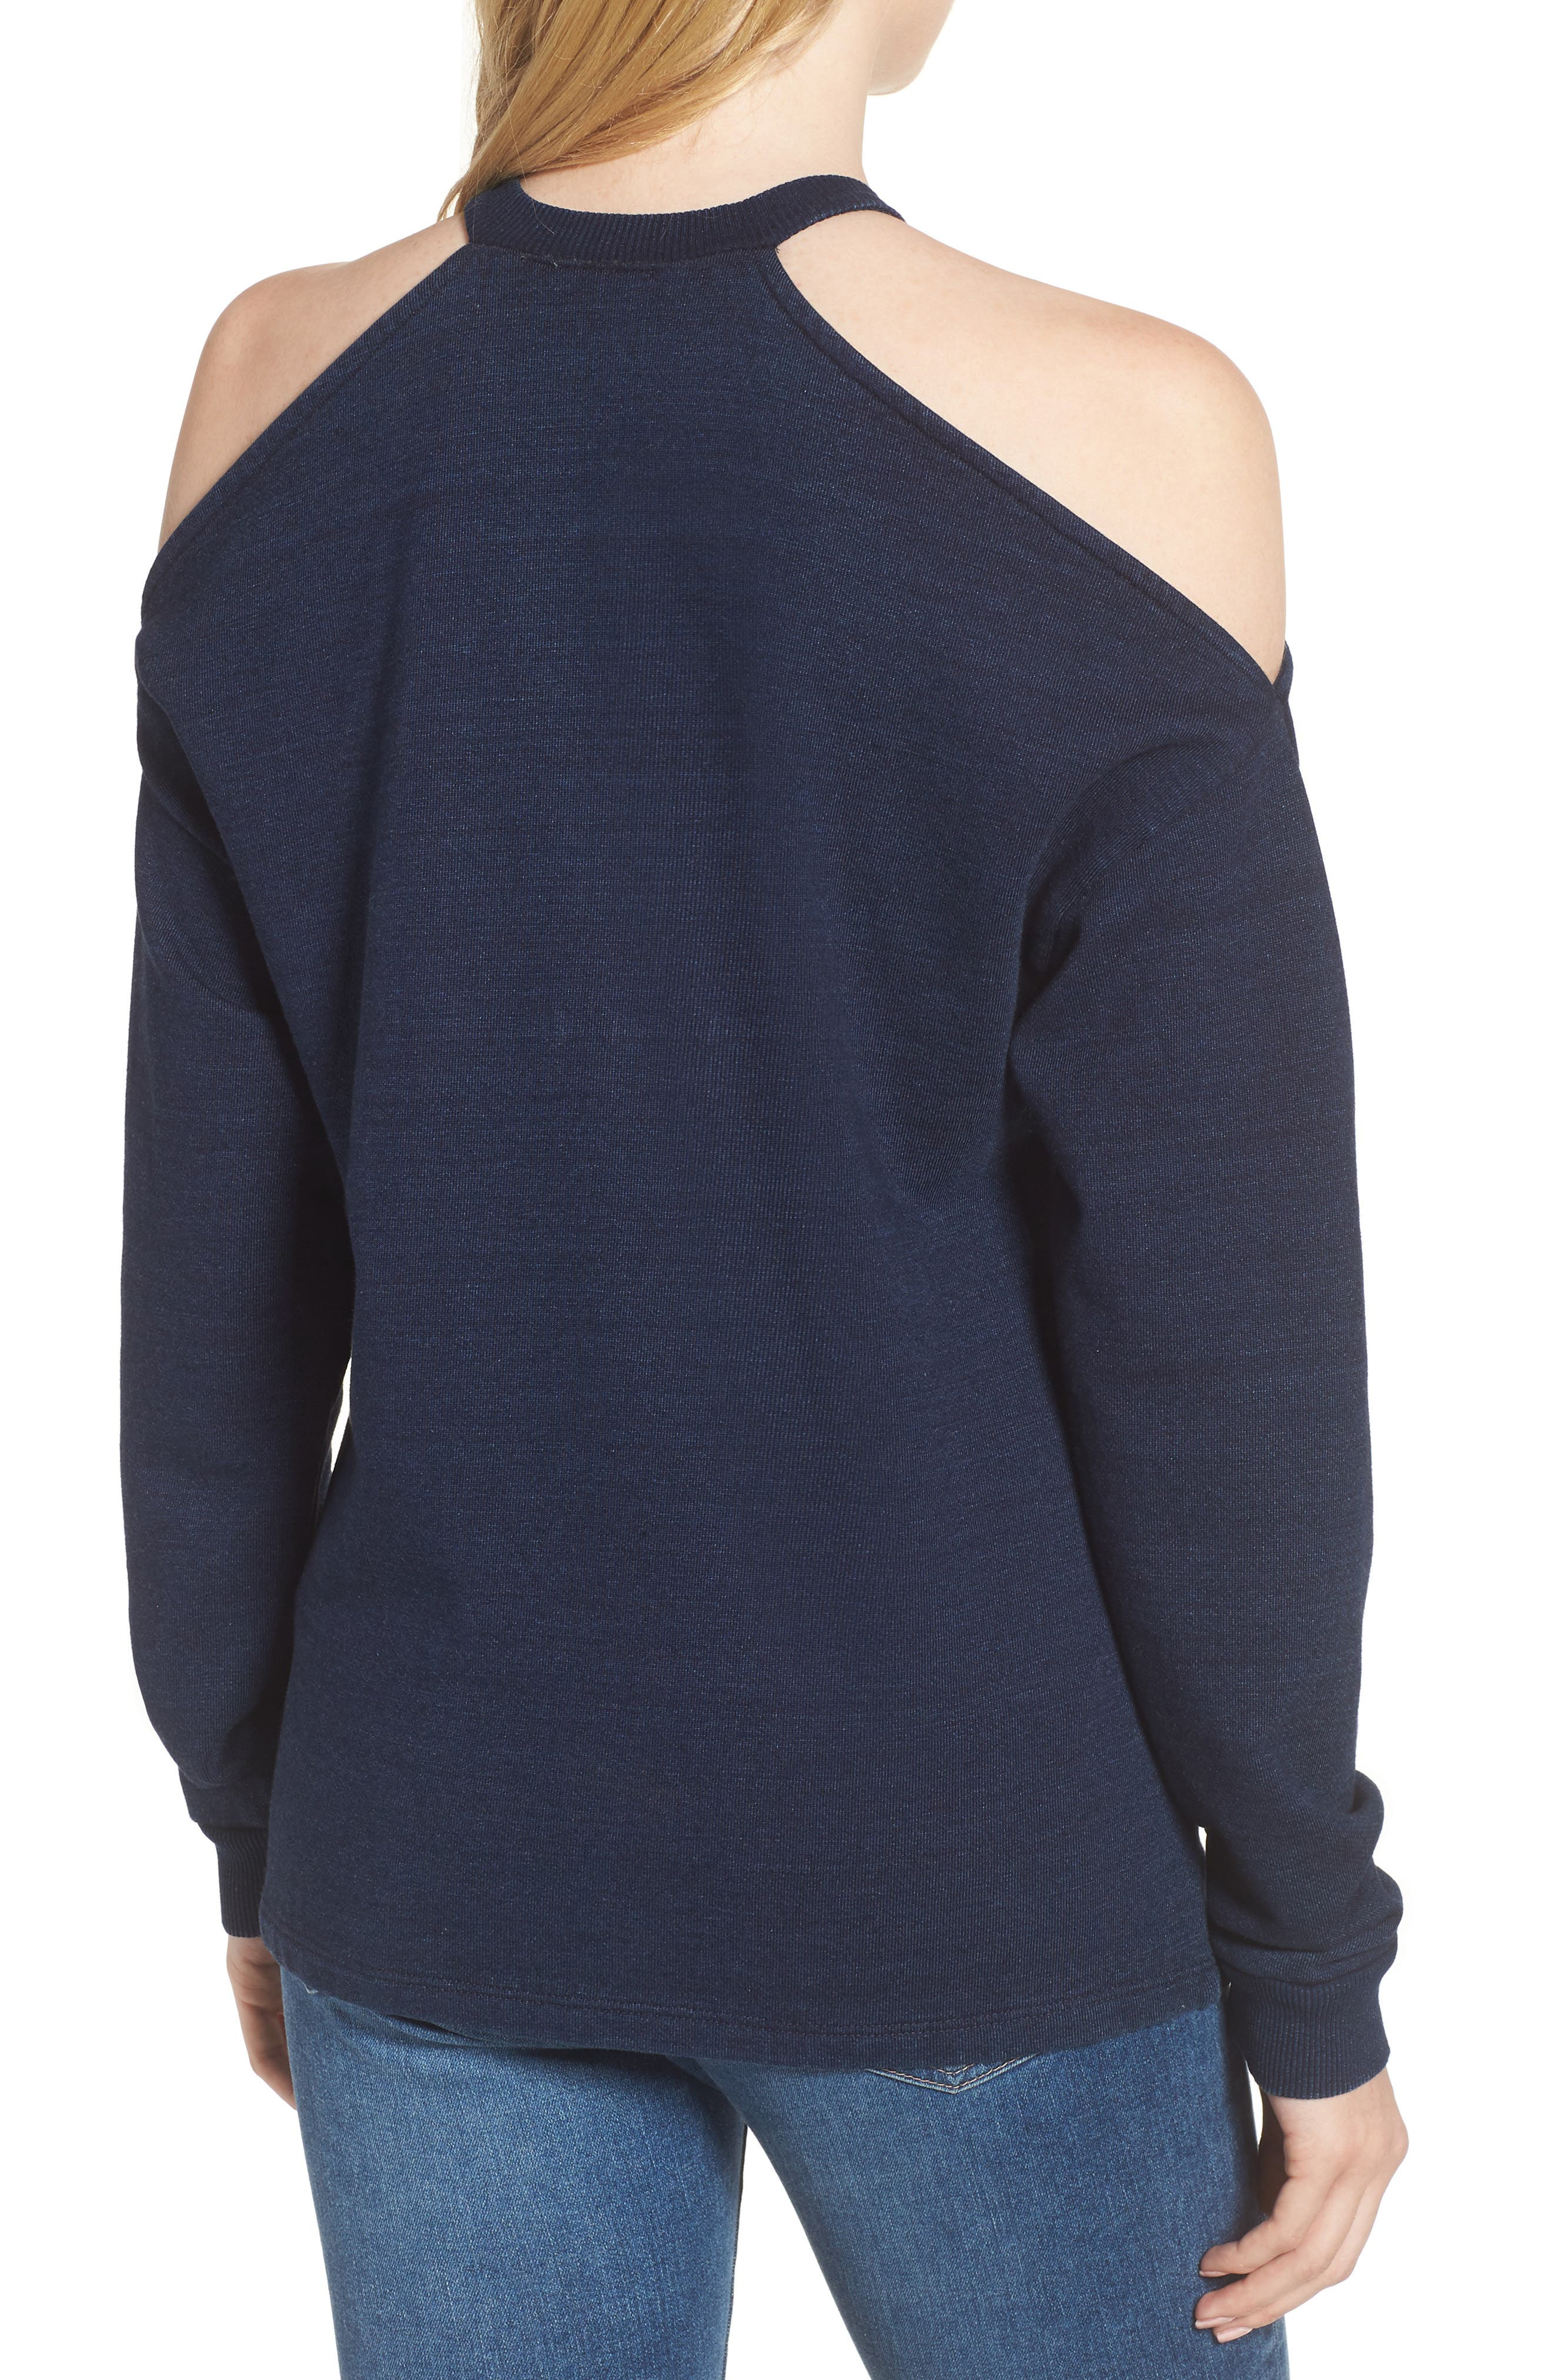 Gizi Cold Shoulder Sweatshirt,                             Alternate thumbnail 2, color,                             489